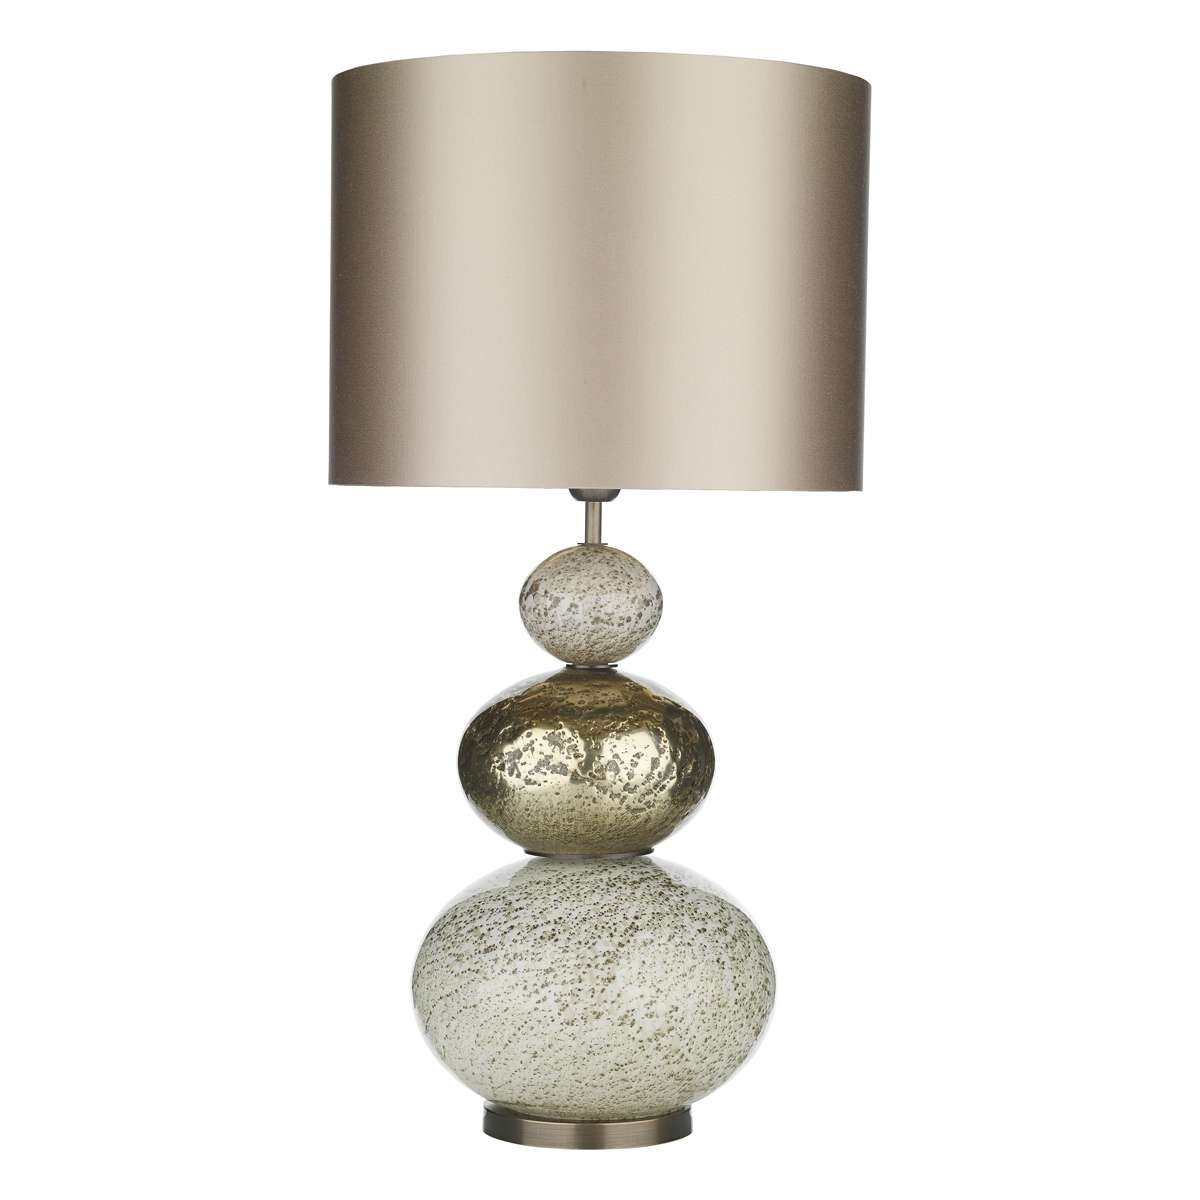 Boavista Volcanic Effect Gold Glass Table Lamp